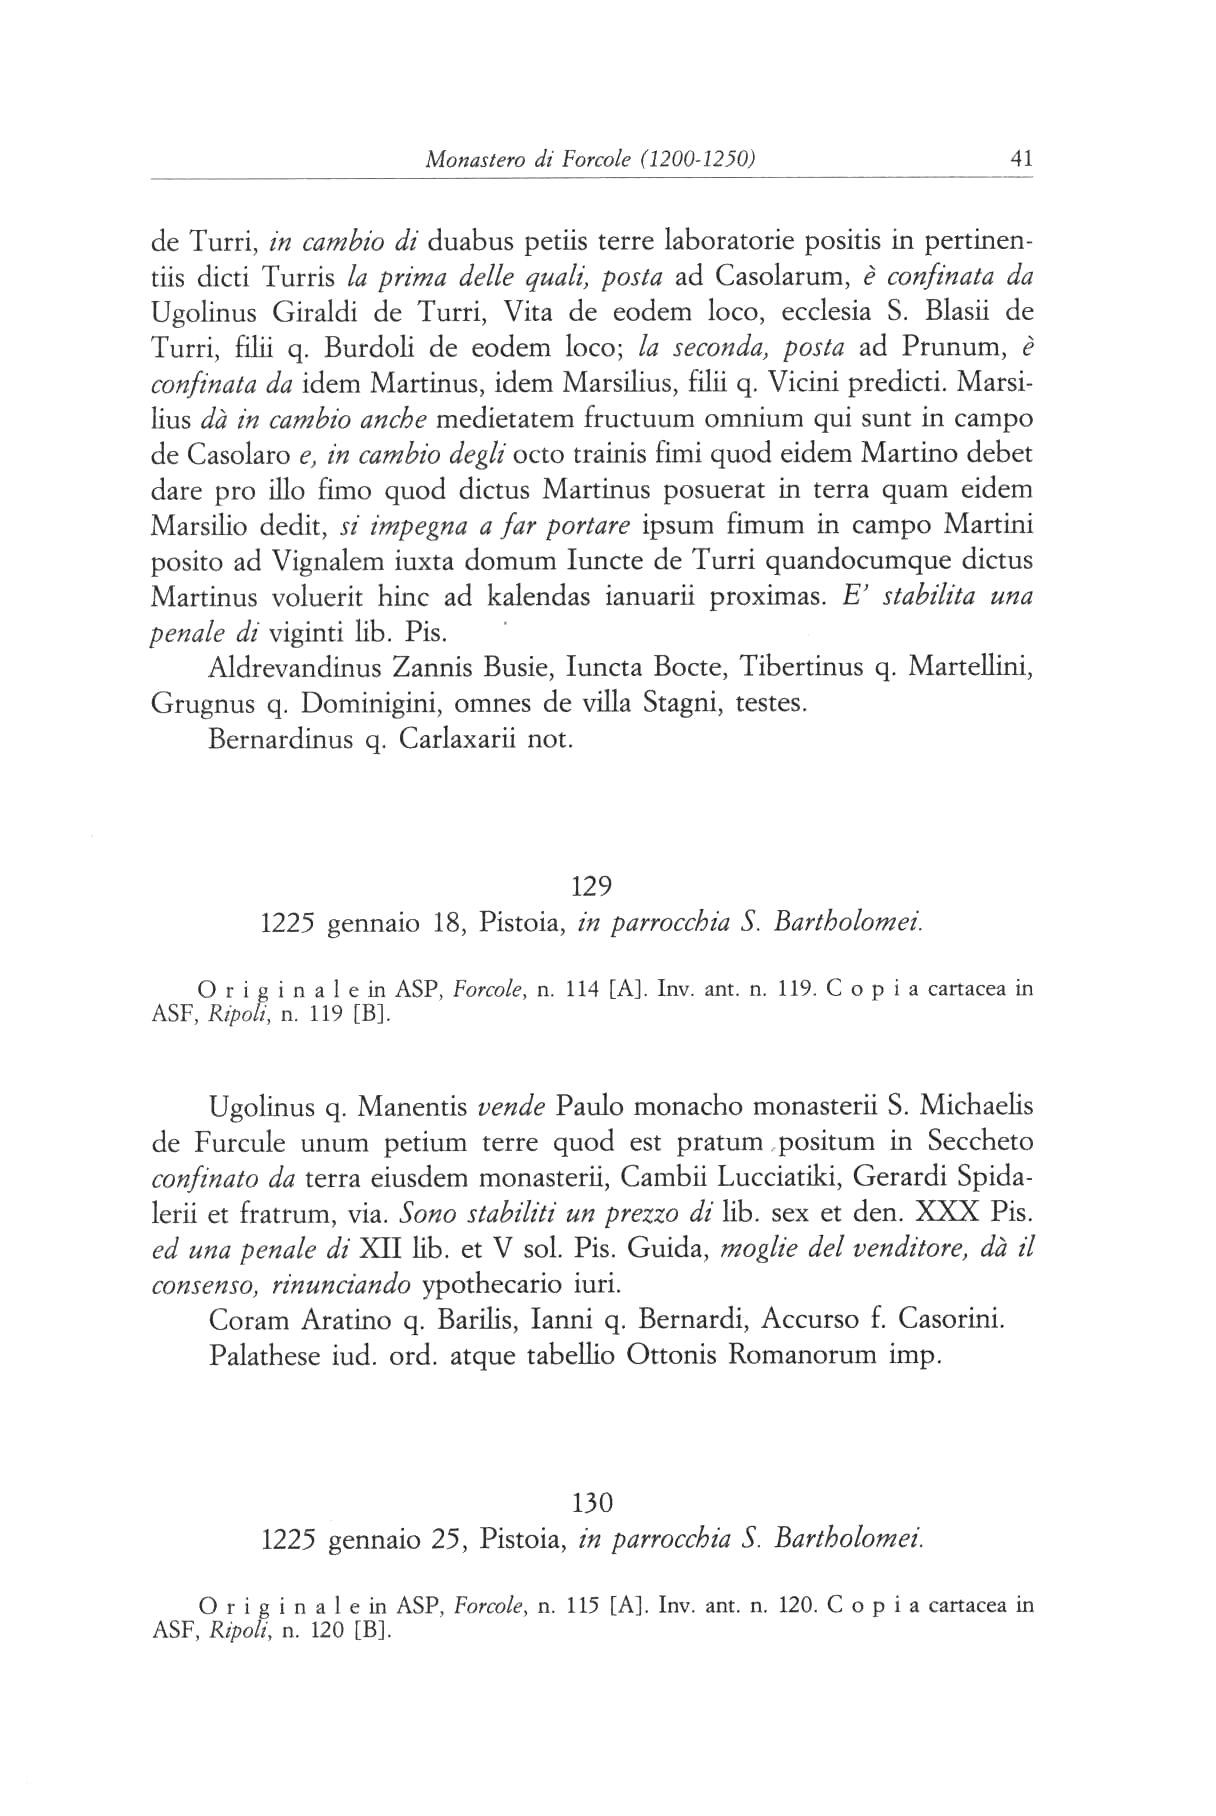 Monastero Forcole 0041.jpg